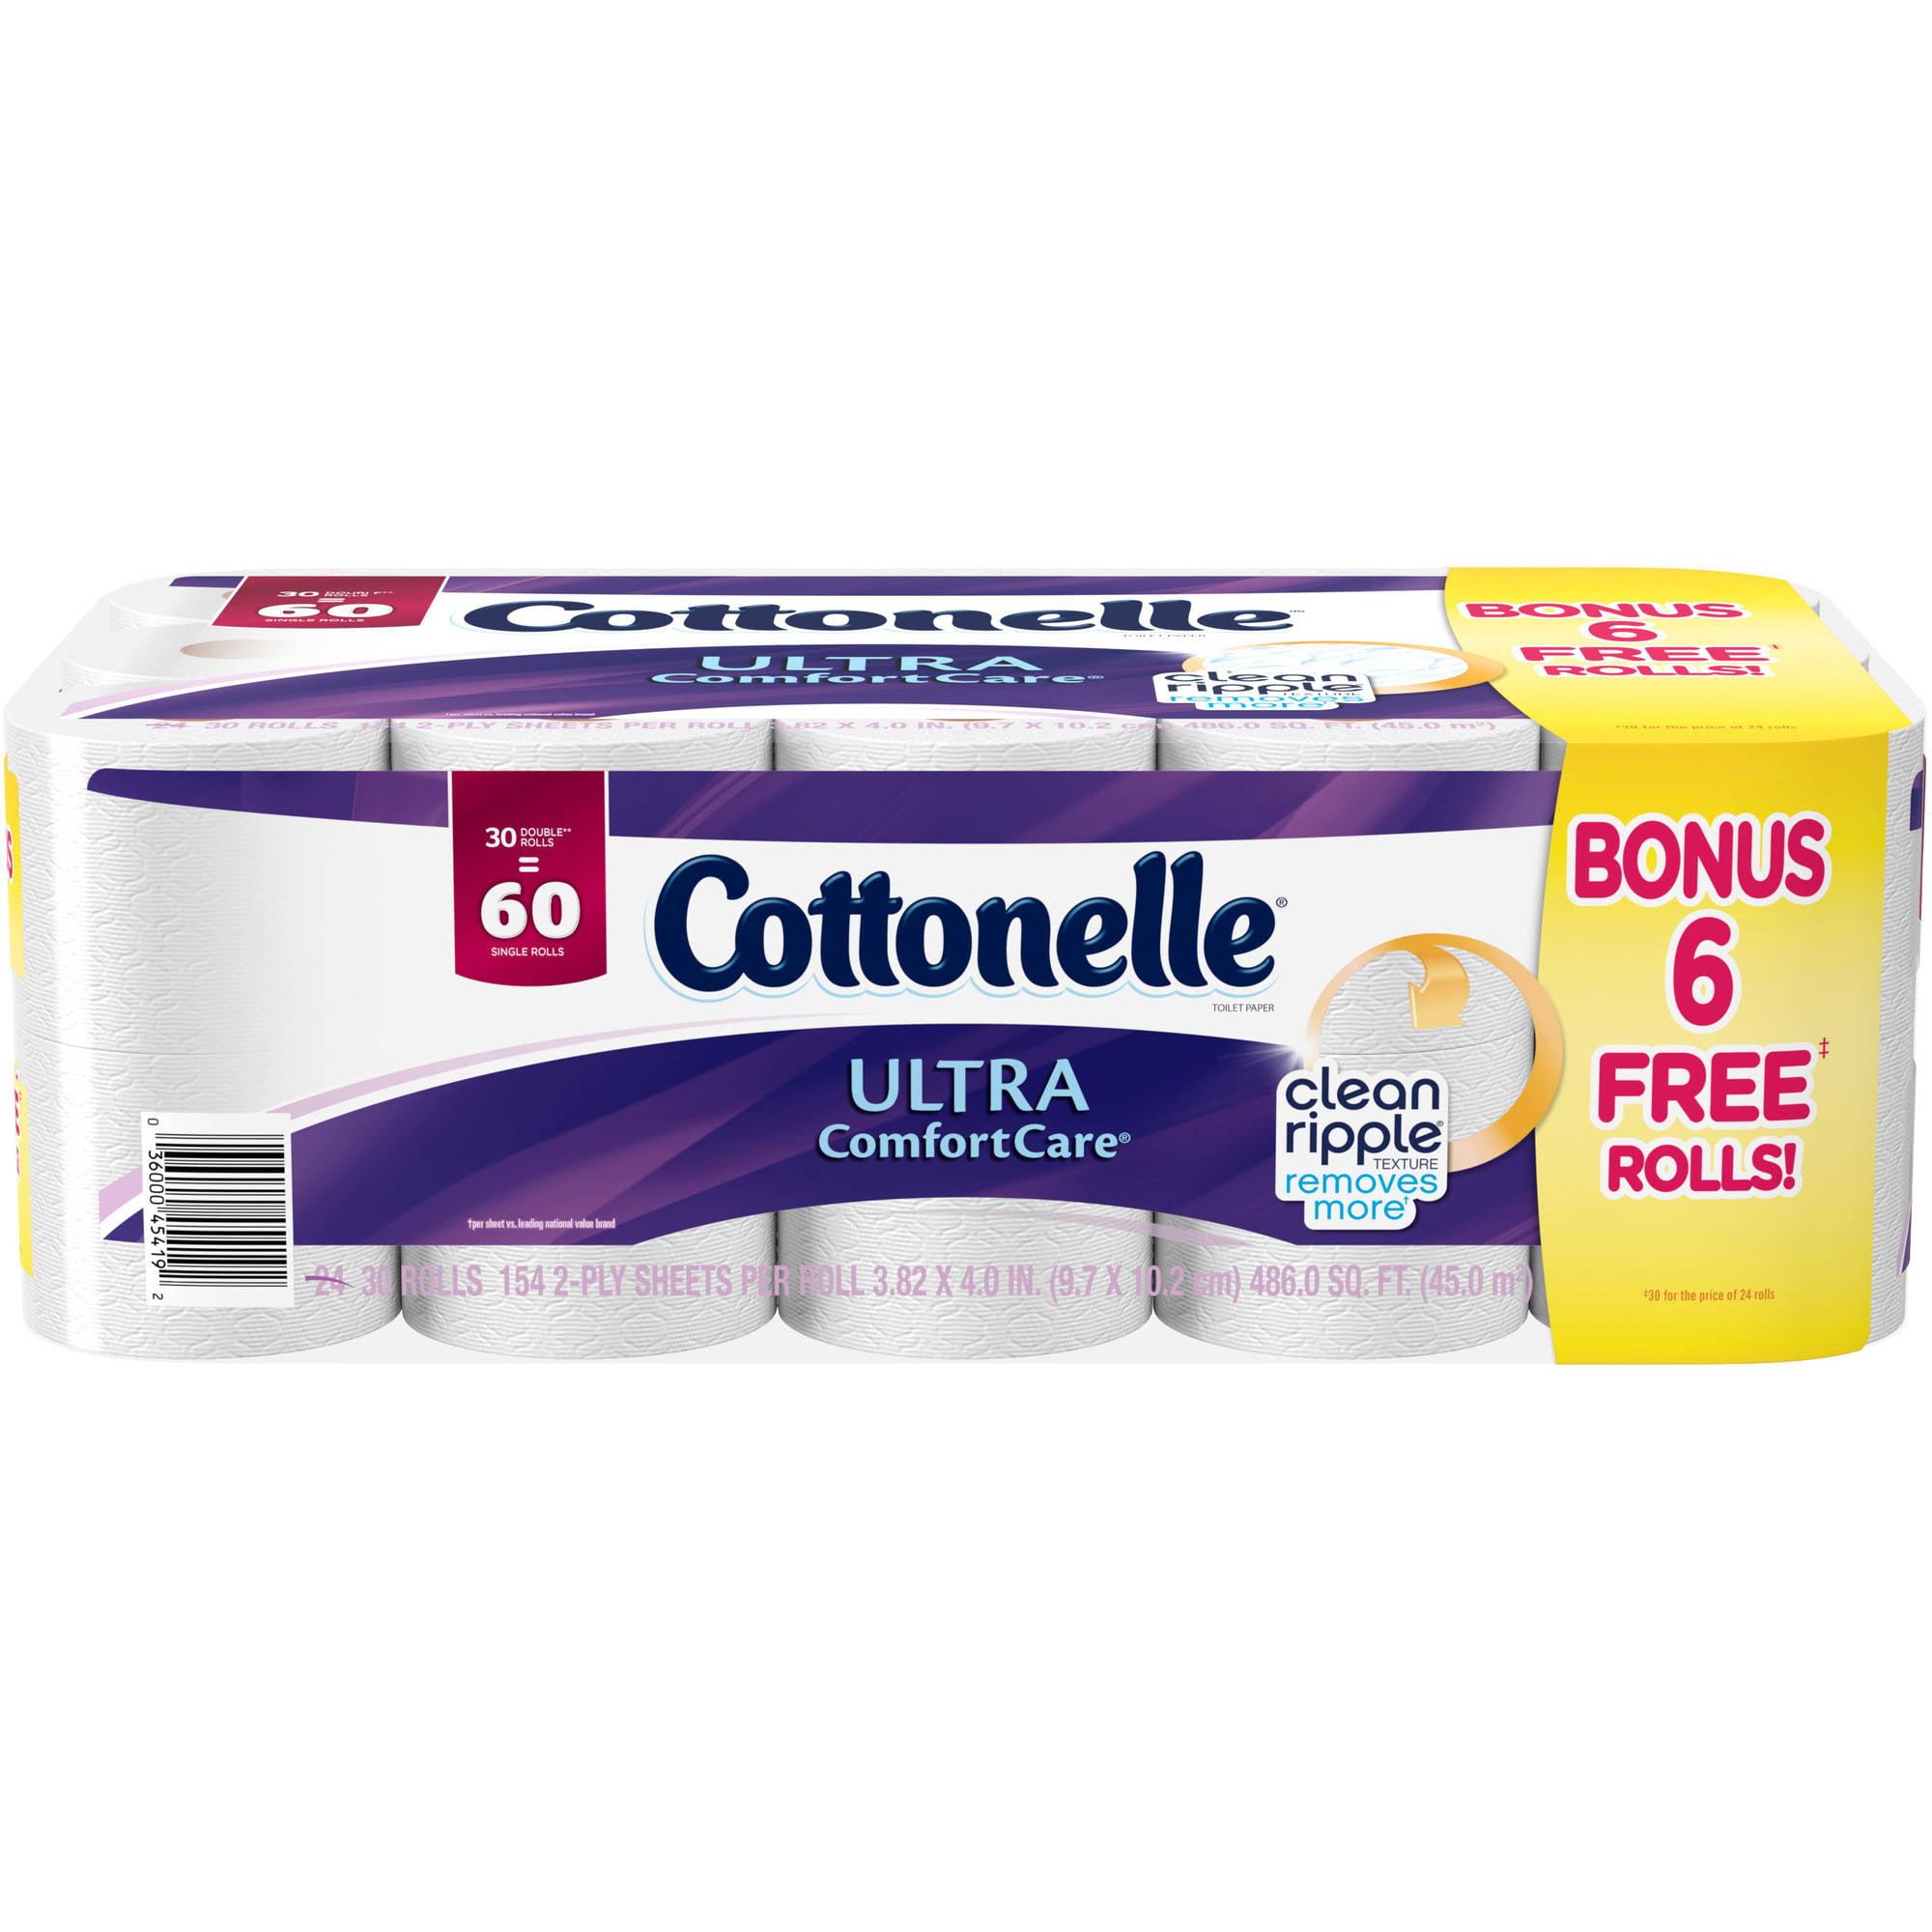 Cottonelle Ultra Comfort Care Bonus Roll Double Roll Toilet Paper, 154 sheets, 30 rolls